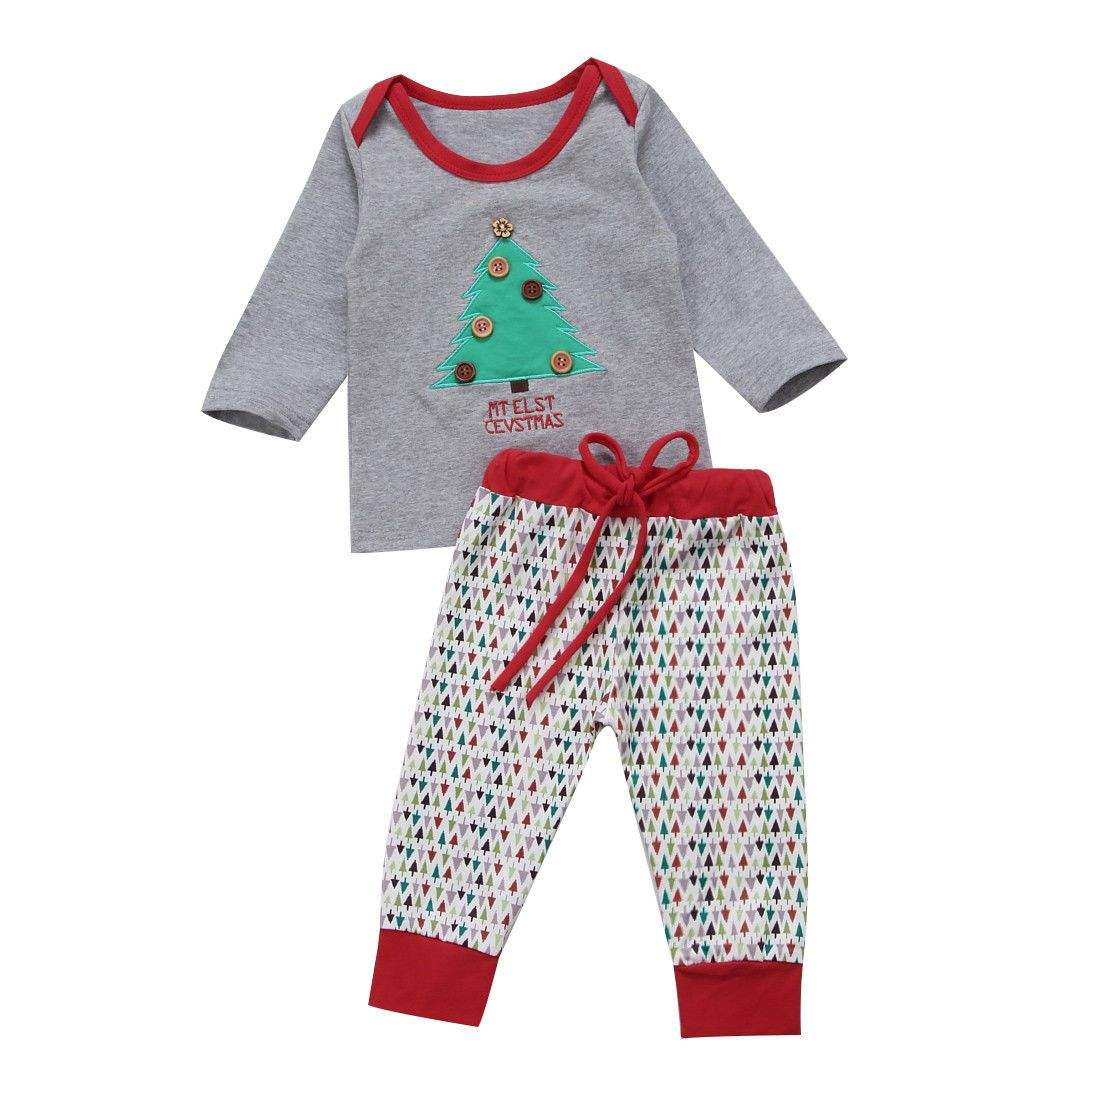 467a37f9f13d4 Baby Clothes Set 2pcs Toddler Baby Boy Kids Christmas Tree T-shirt ...